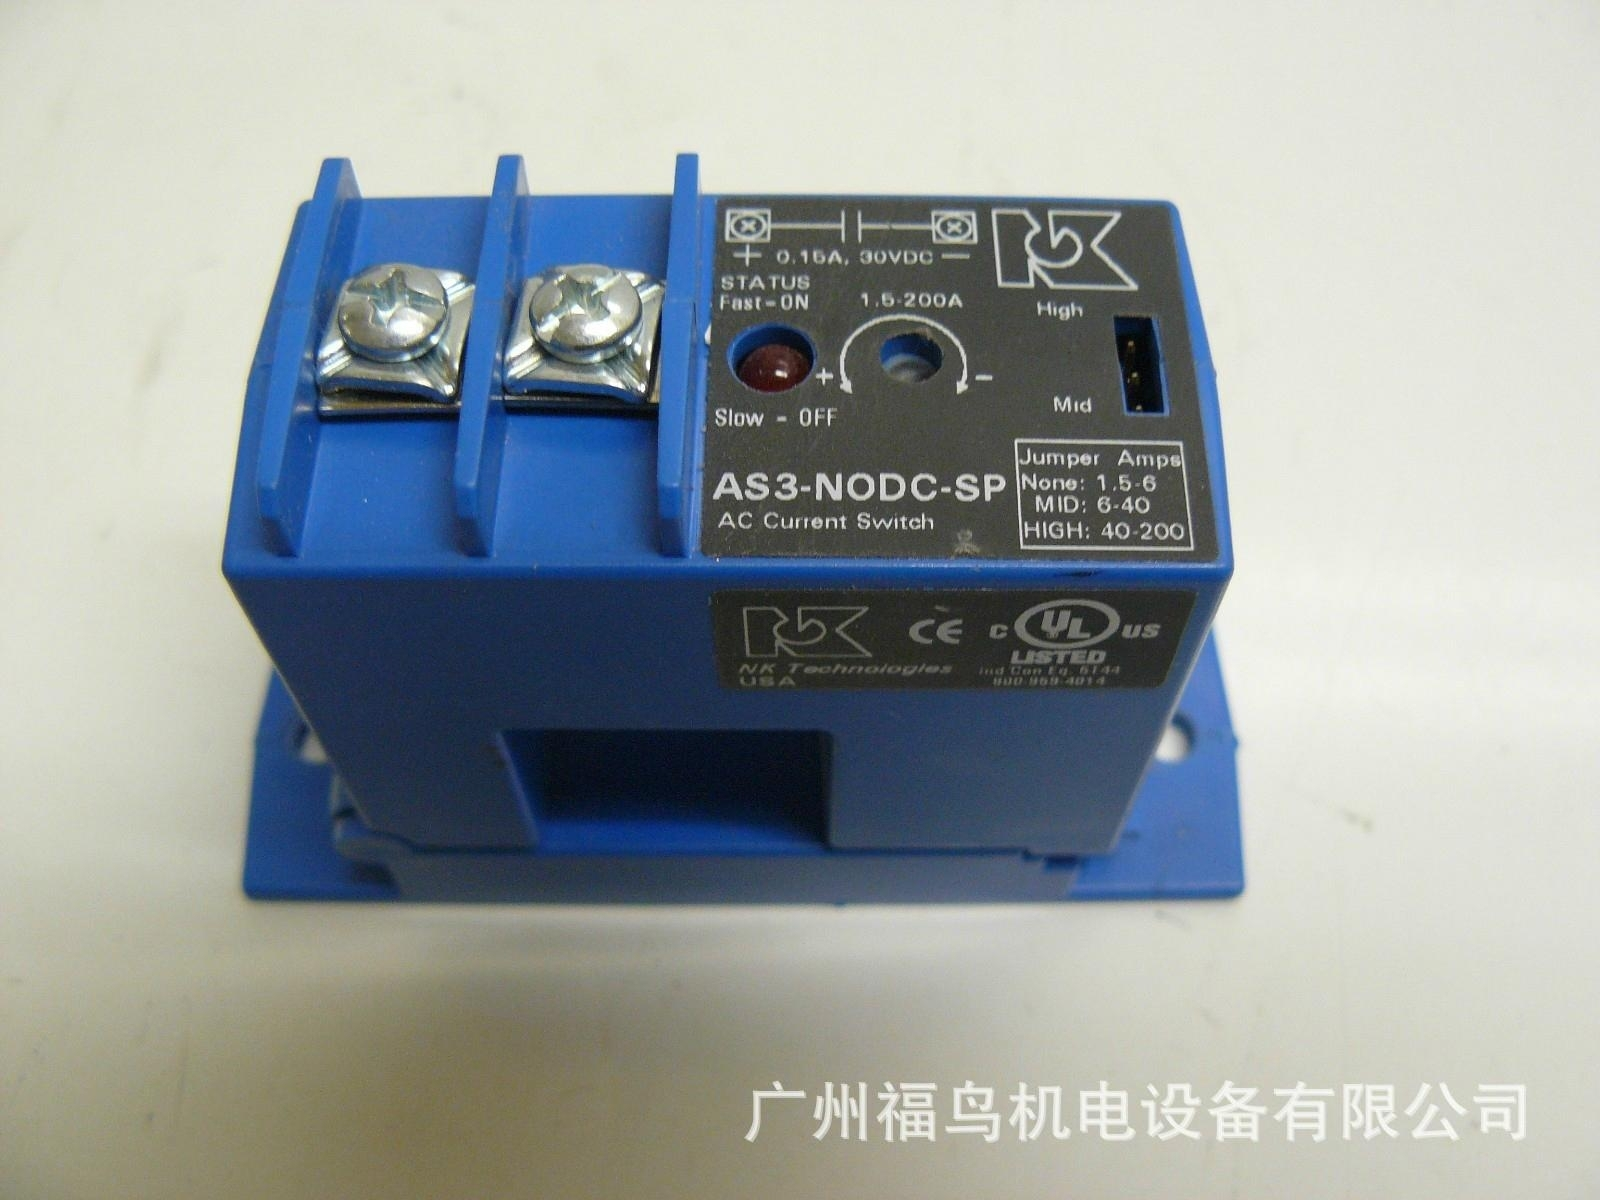 NK TECHNOLOGIES電流傳感器, 型號: AS3-NODC-SP